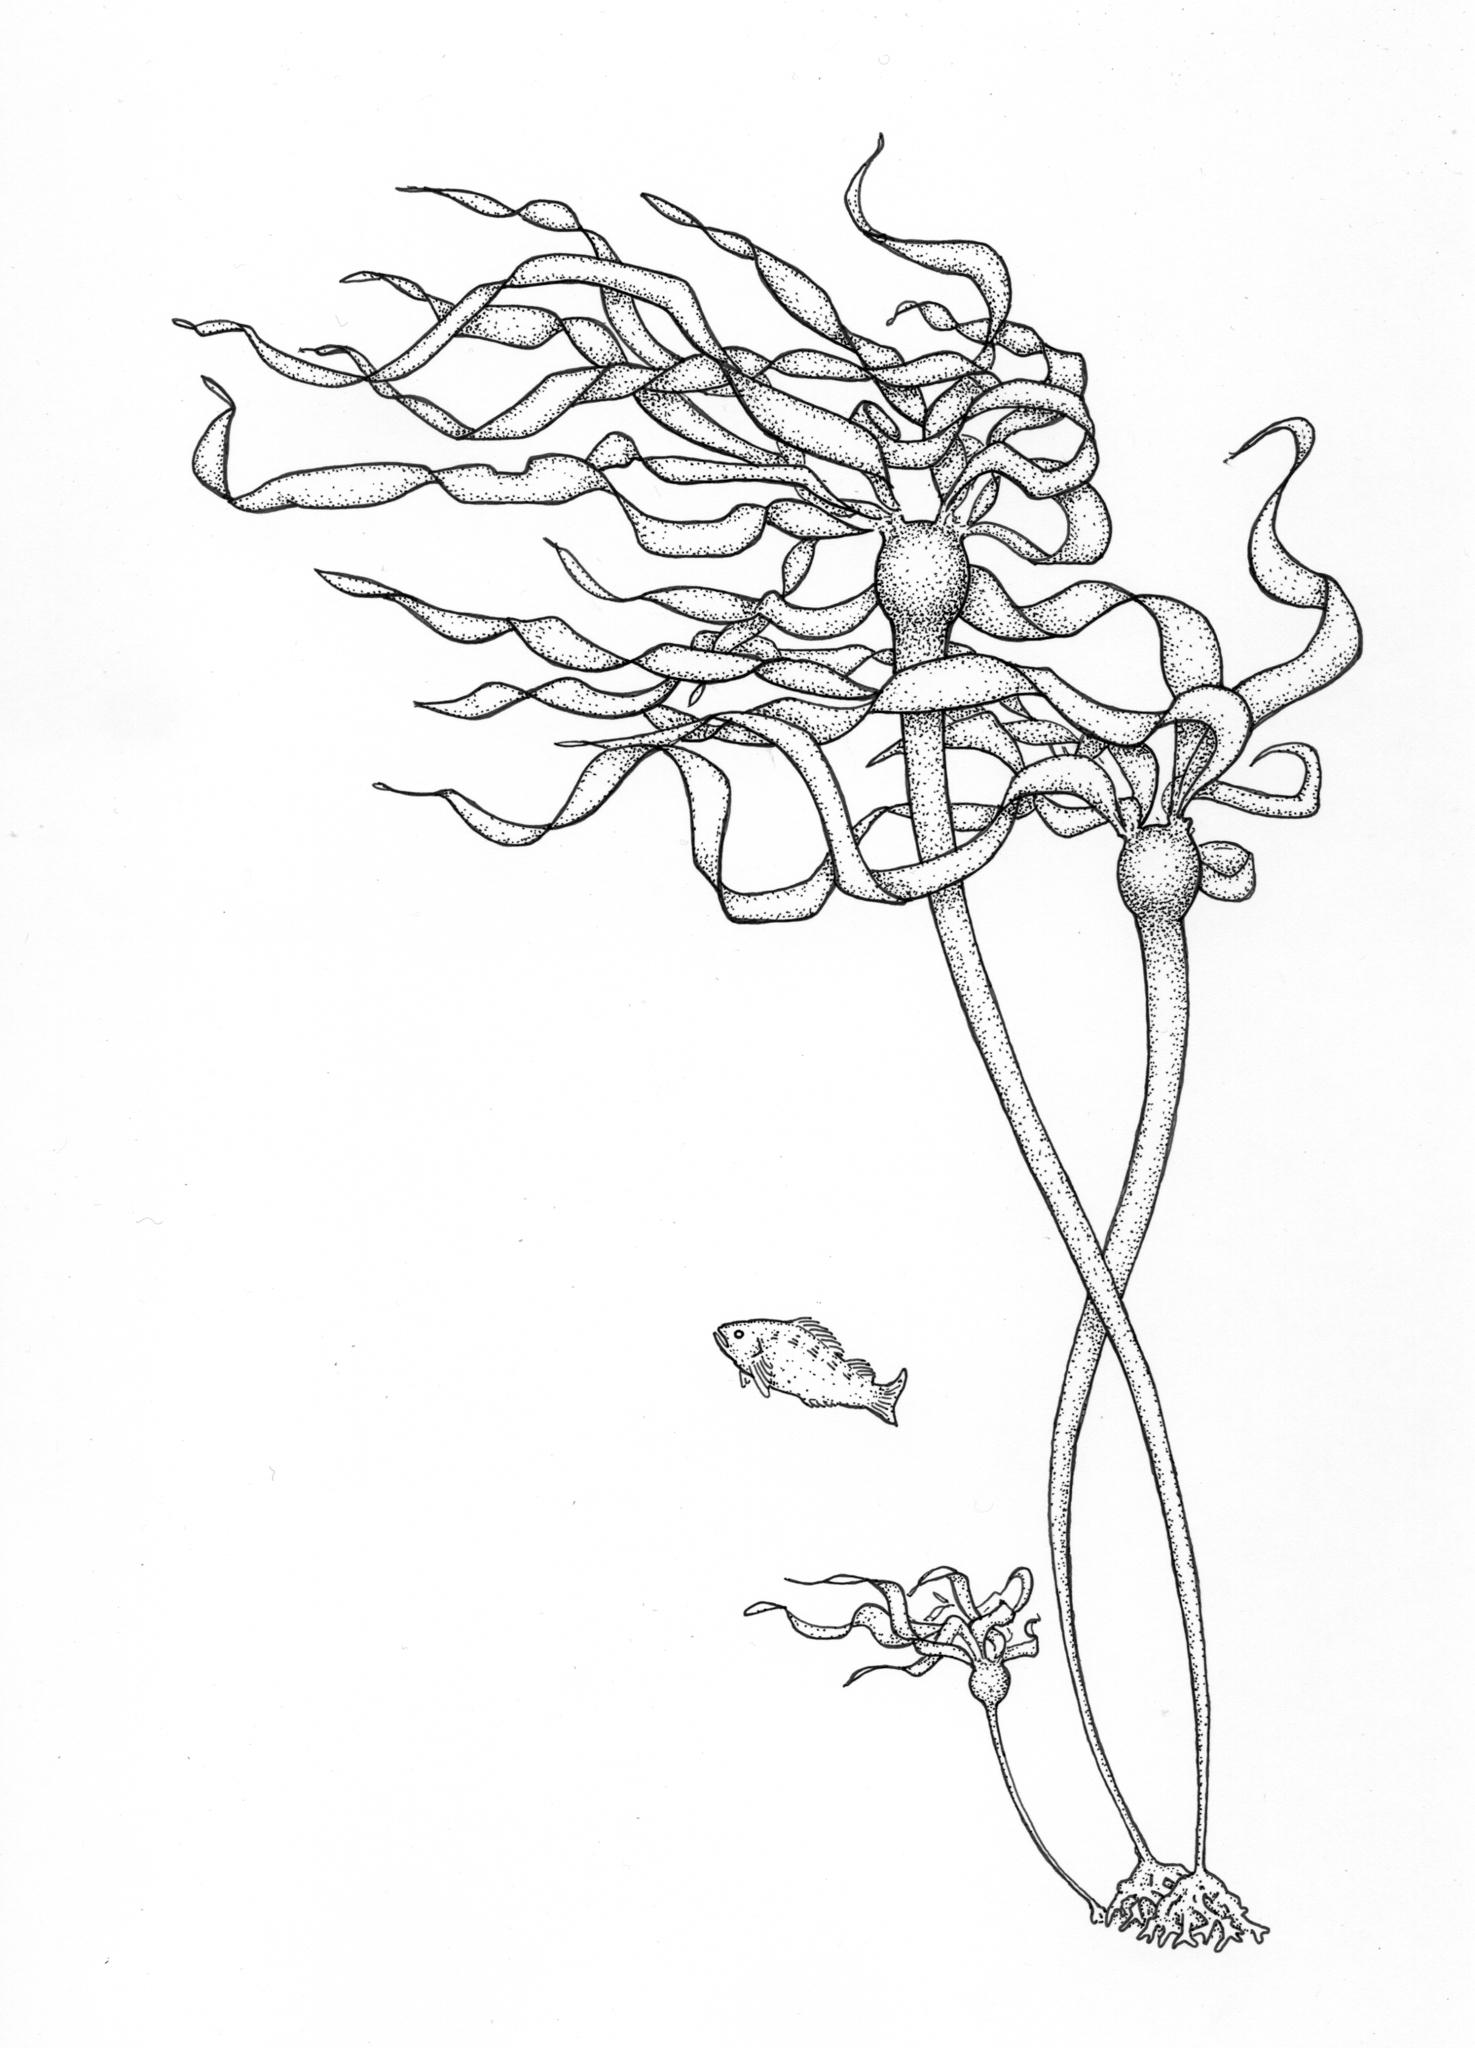 Bull Kelp Nereocystis luetkeana drawing